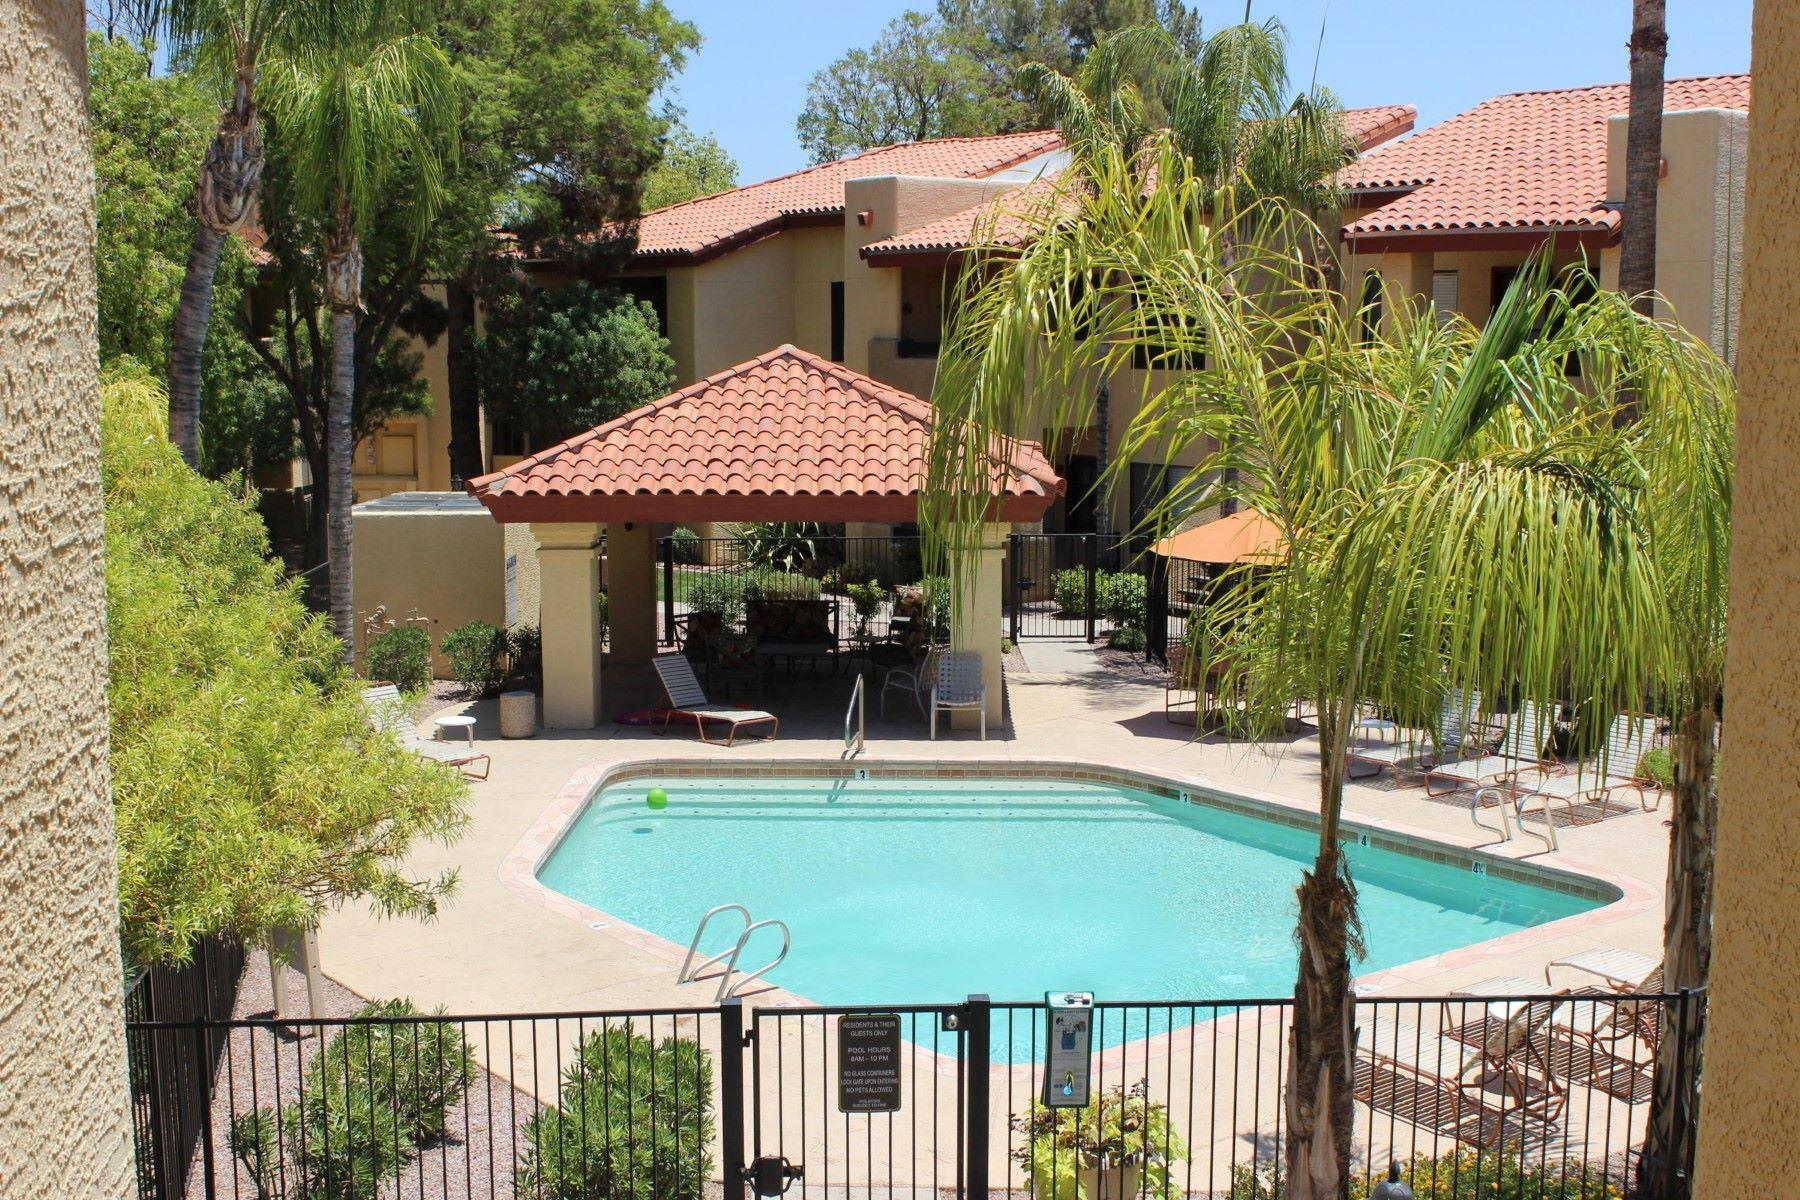 Appartement pour l à louer à Incredible poolside home in the desirable gated Barcelona Condominium 7008 E Gold Dust Ave #227 Paradise Valley, Arizona, 85253 États-Unis